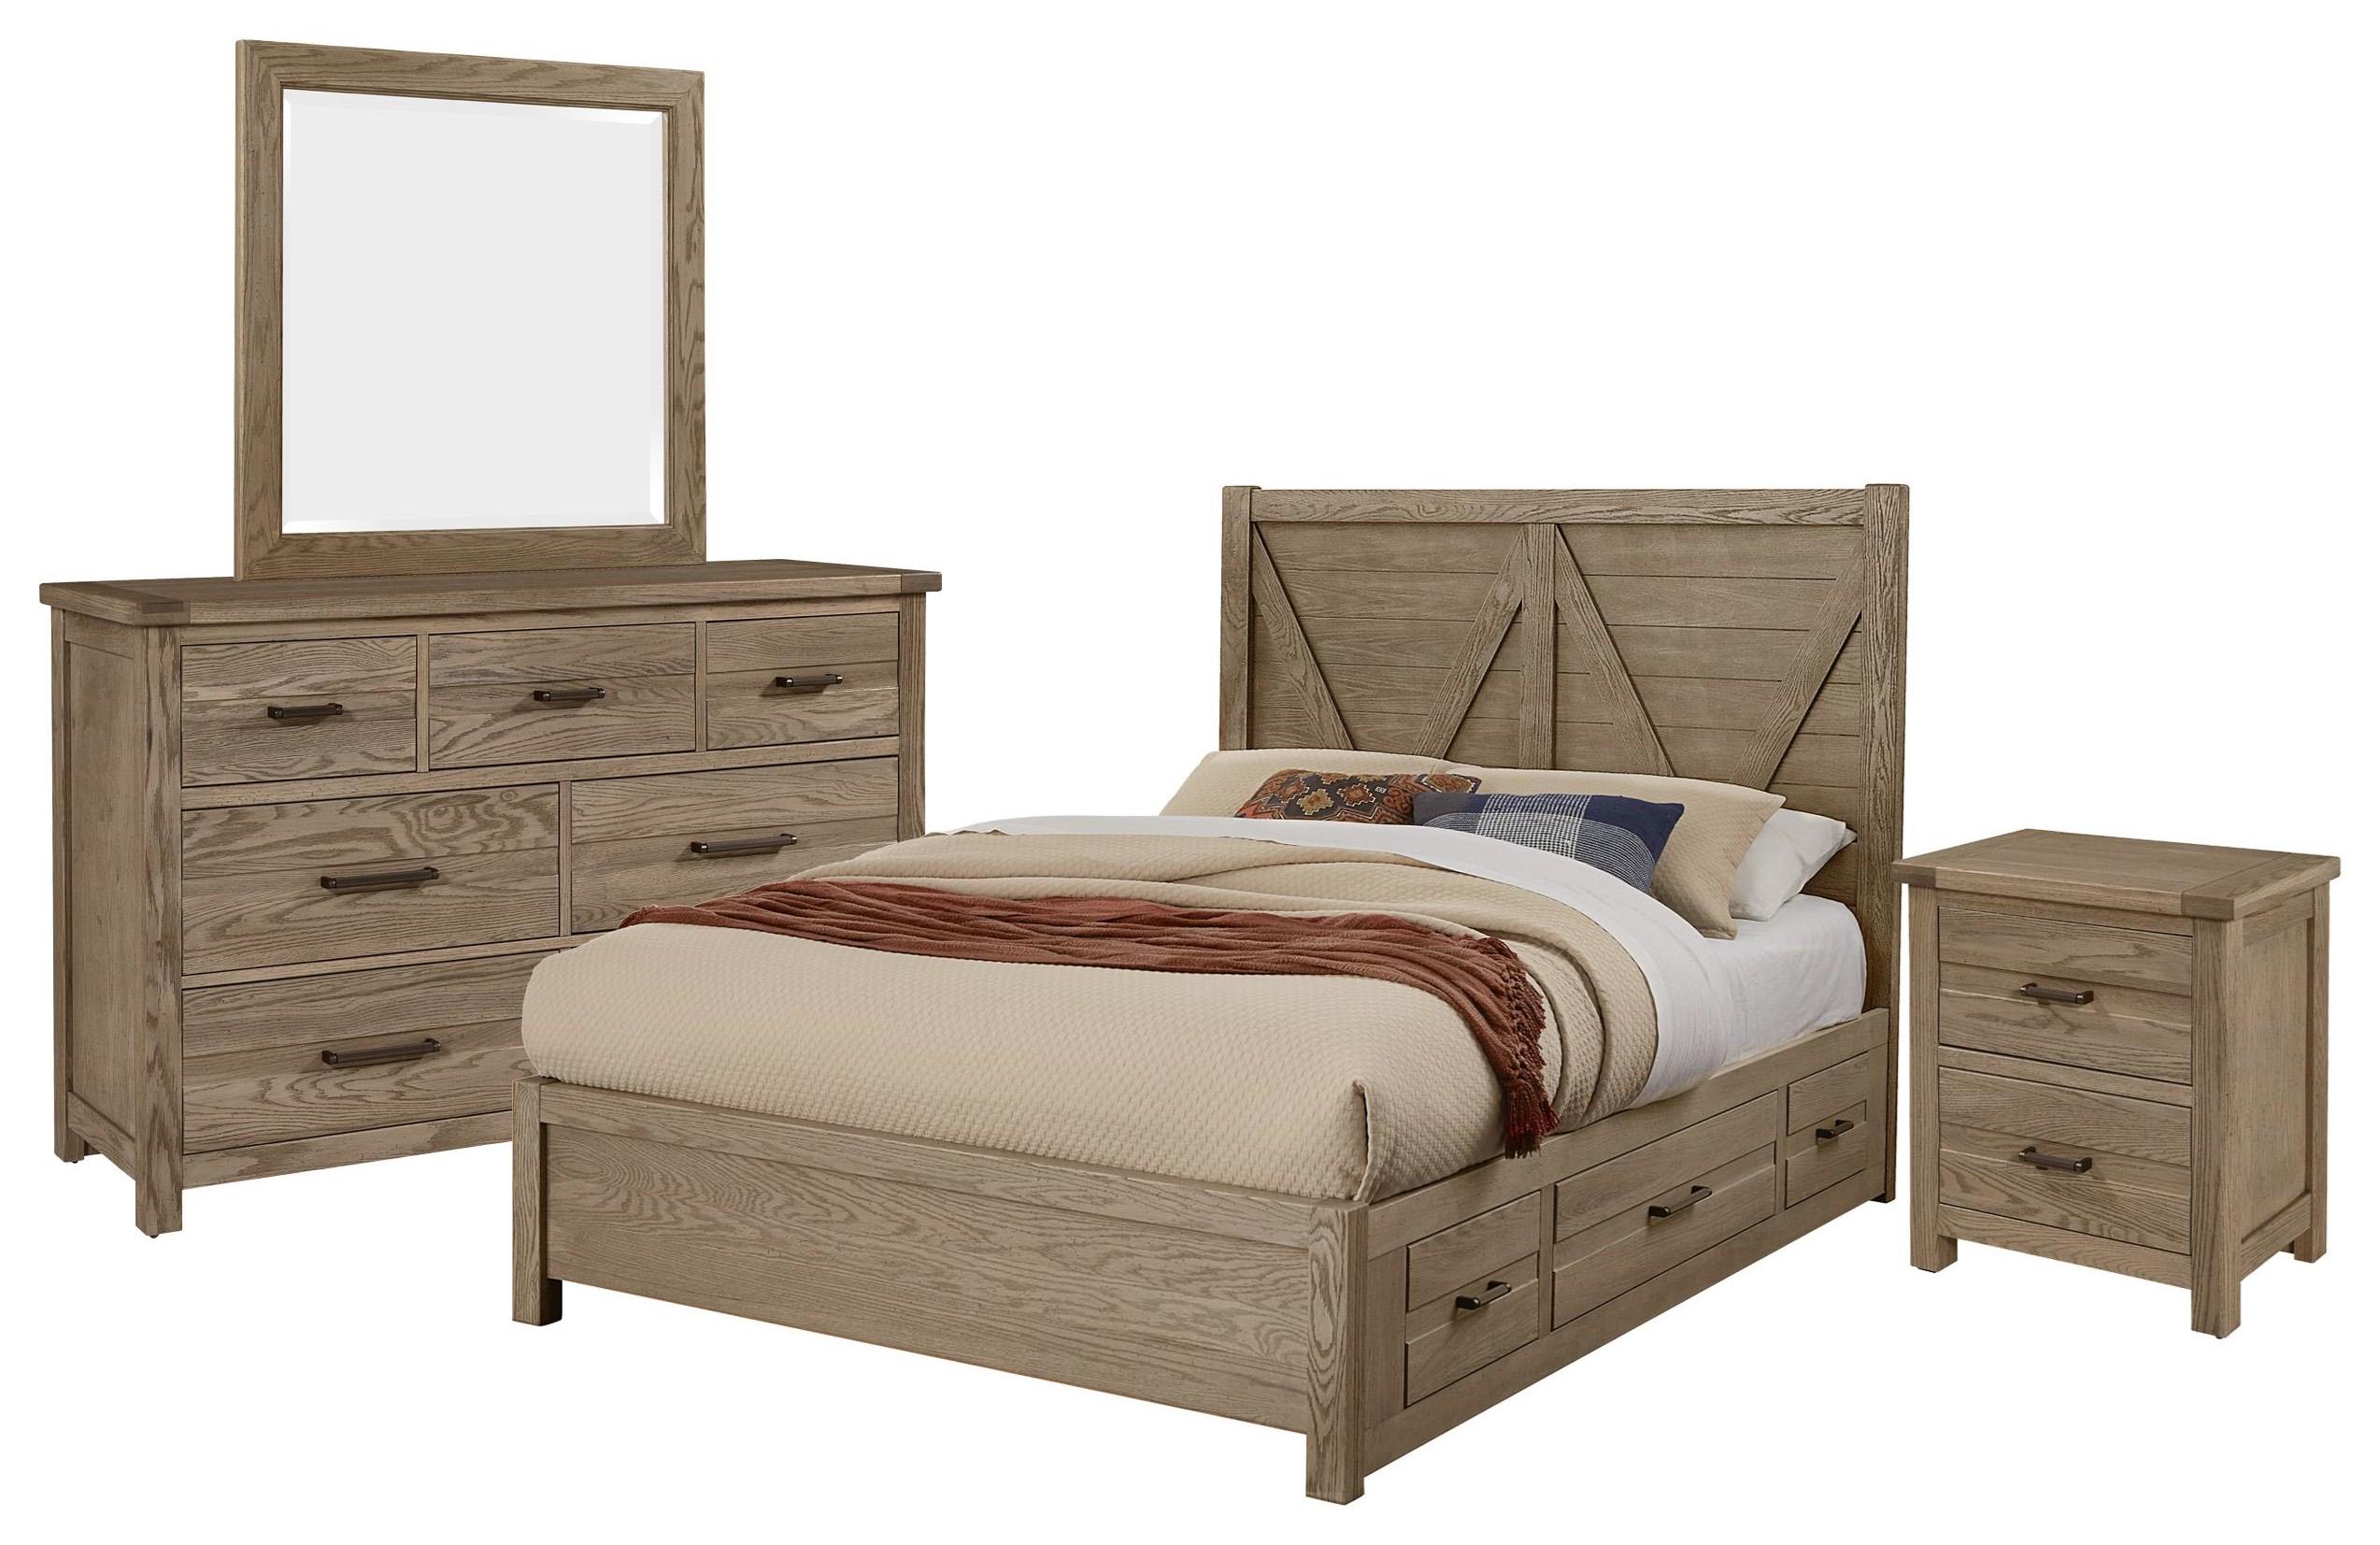 Highland Queen V BED 2 SIDE, Dresser, Mirror, Nightst by Vaughan Bassett at Johnny Janosik